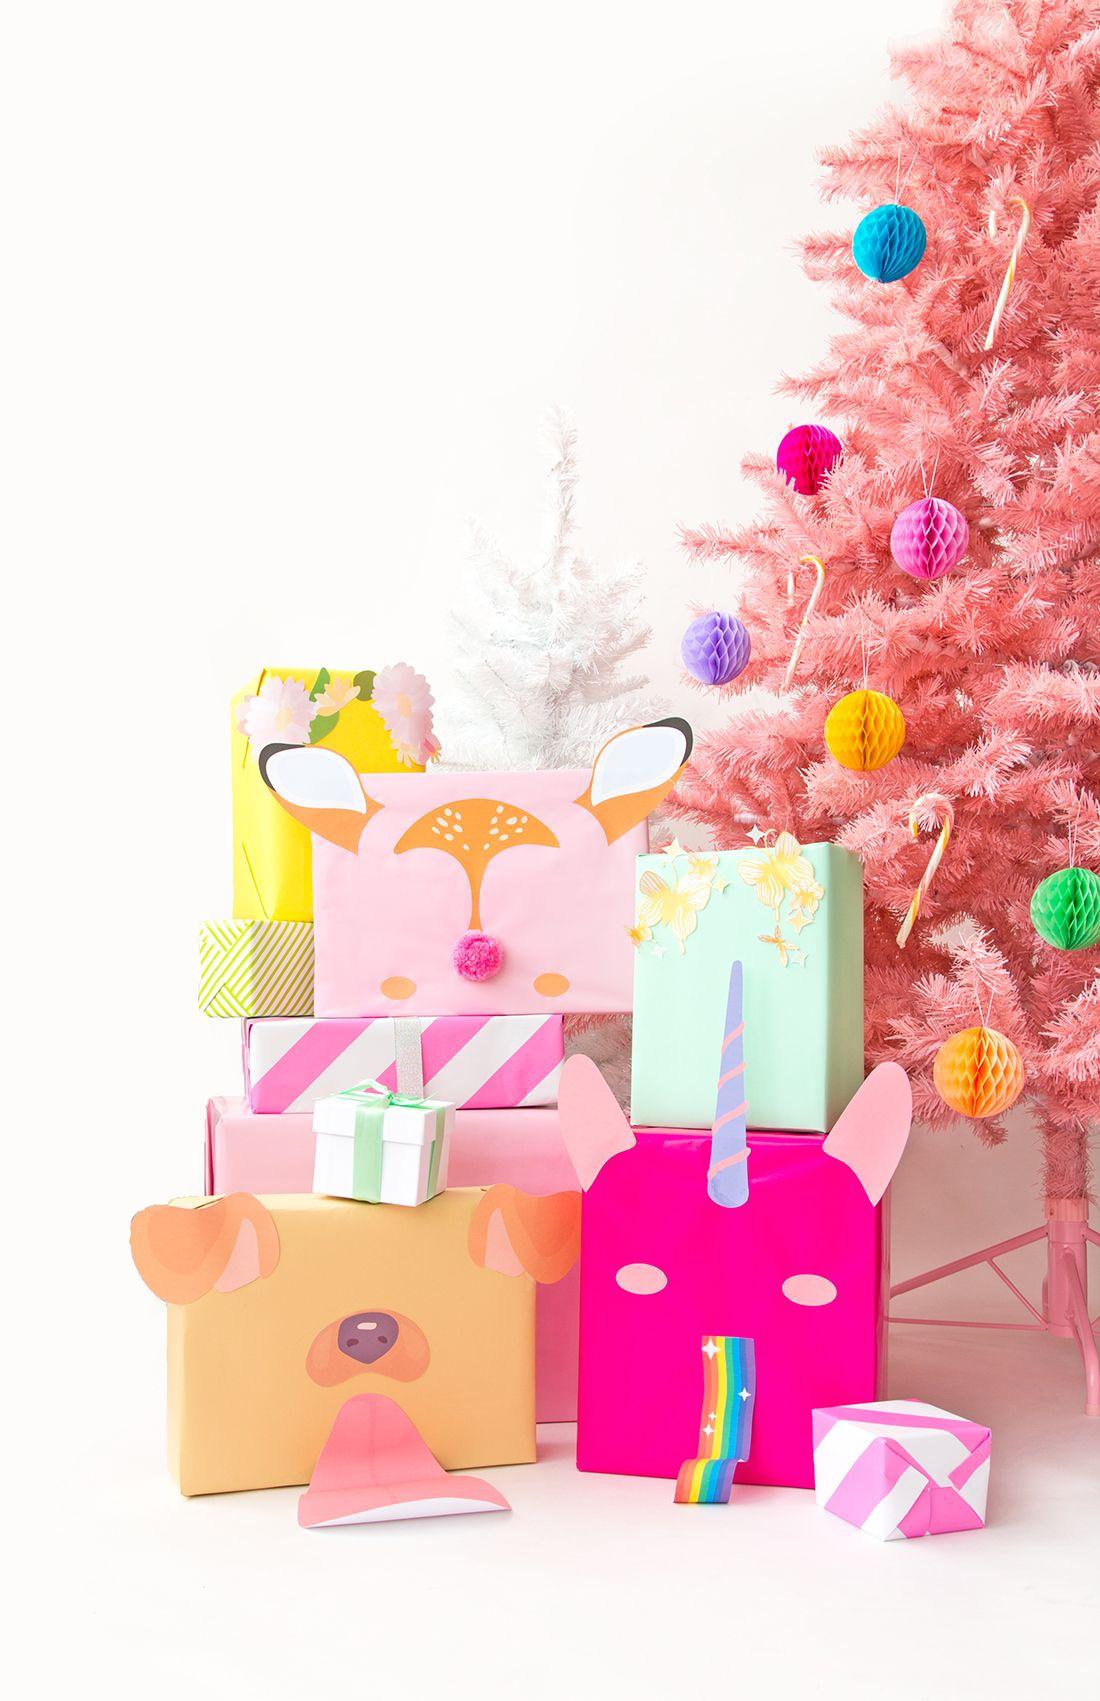 4 snapchat filter presents | holiday: christmas | Pinterest